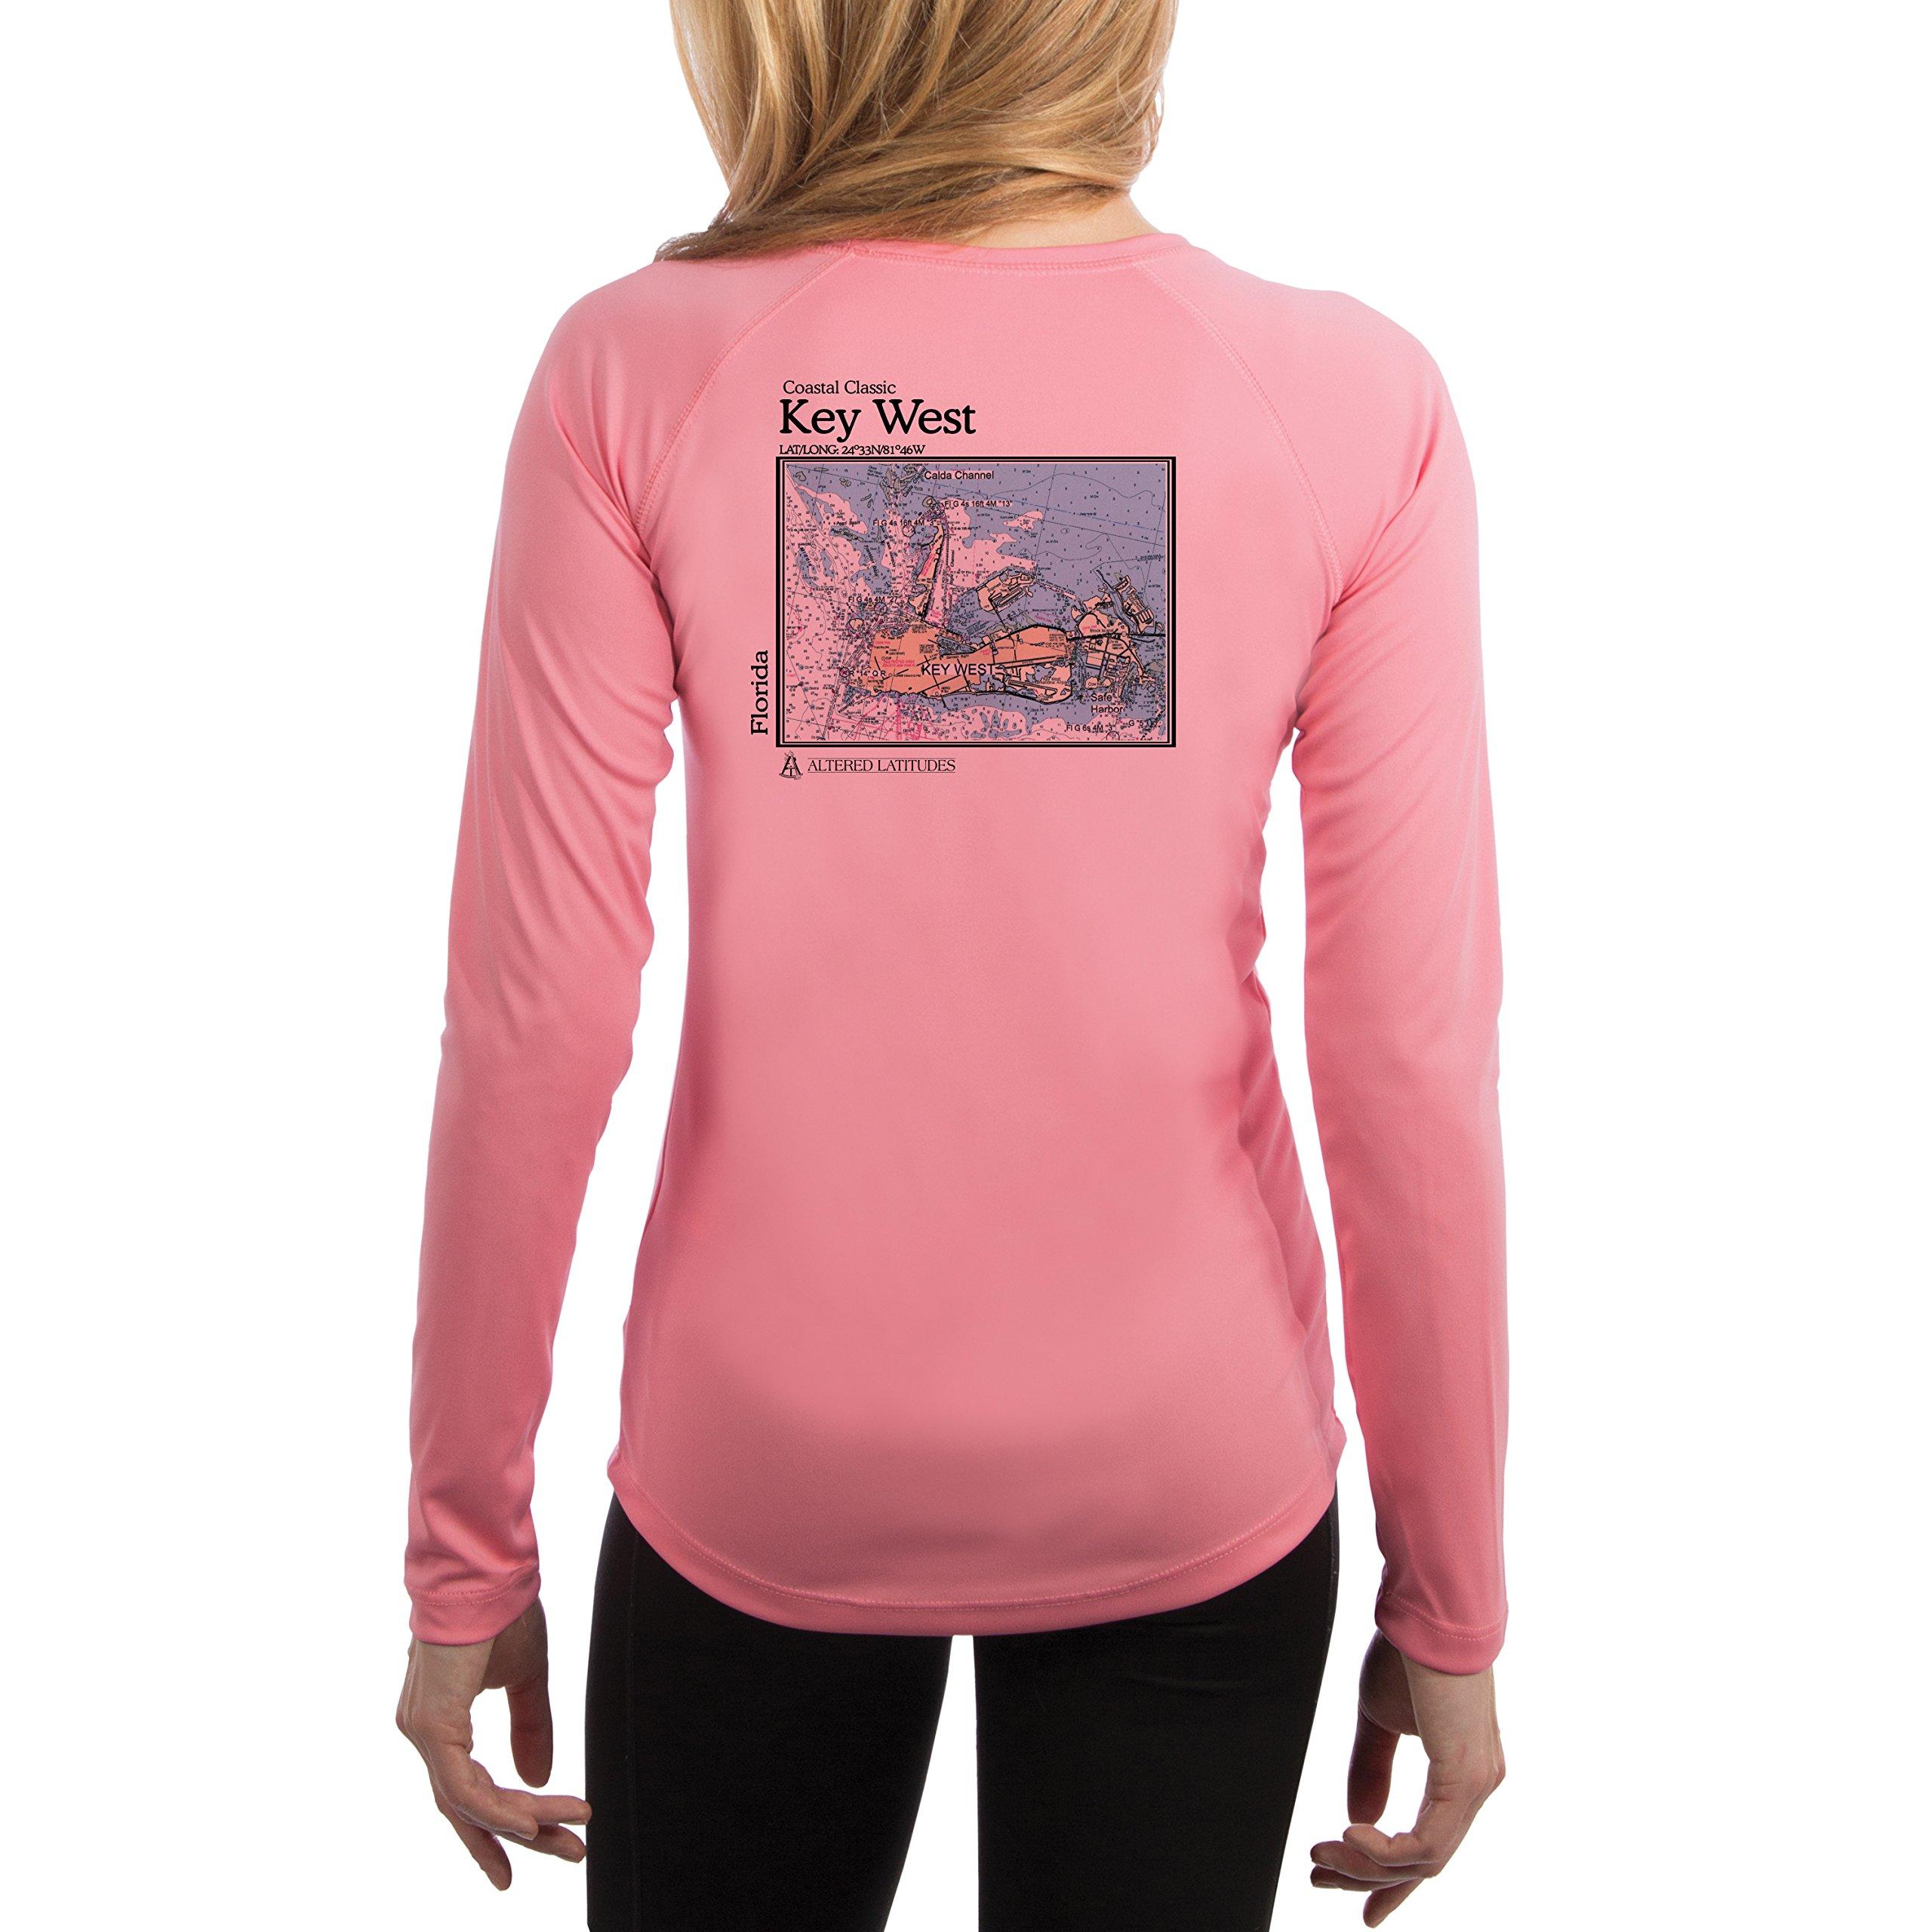 Key West Chart Women's UPF 50+ Sun Protection Long Sleeve T-shirt Medium Pretty Pink by Altered Latitudes